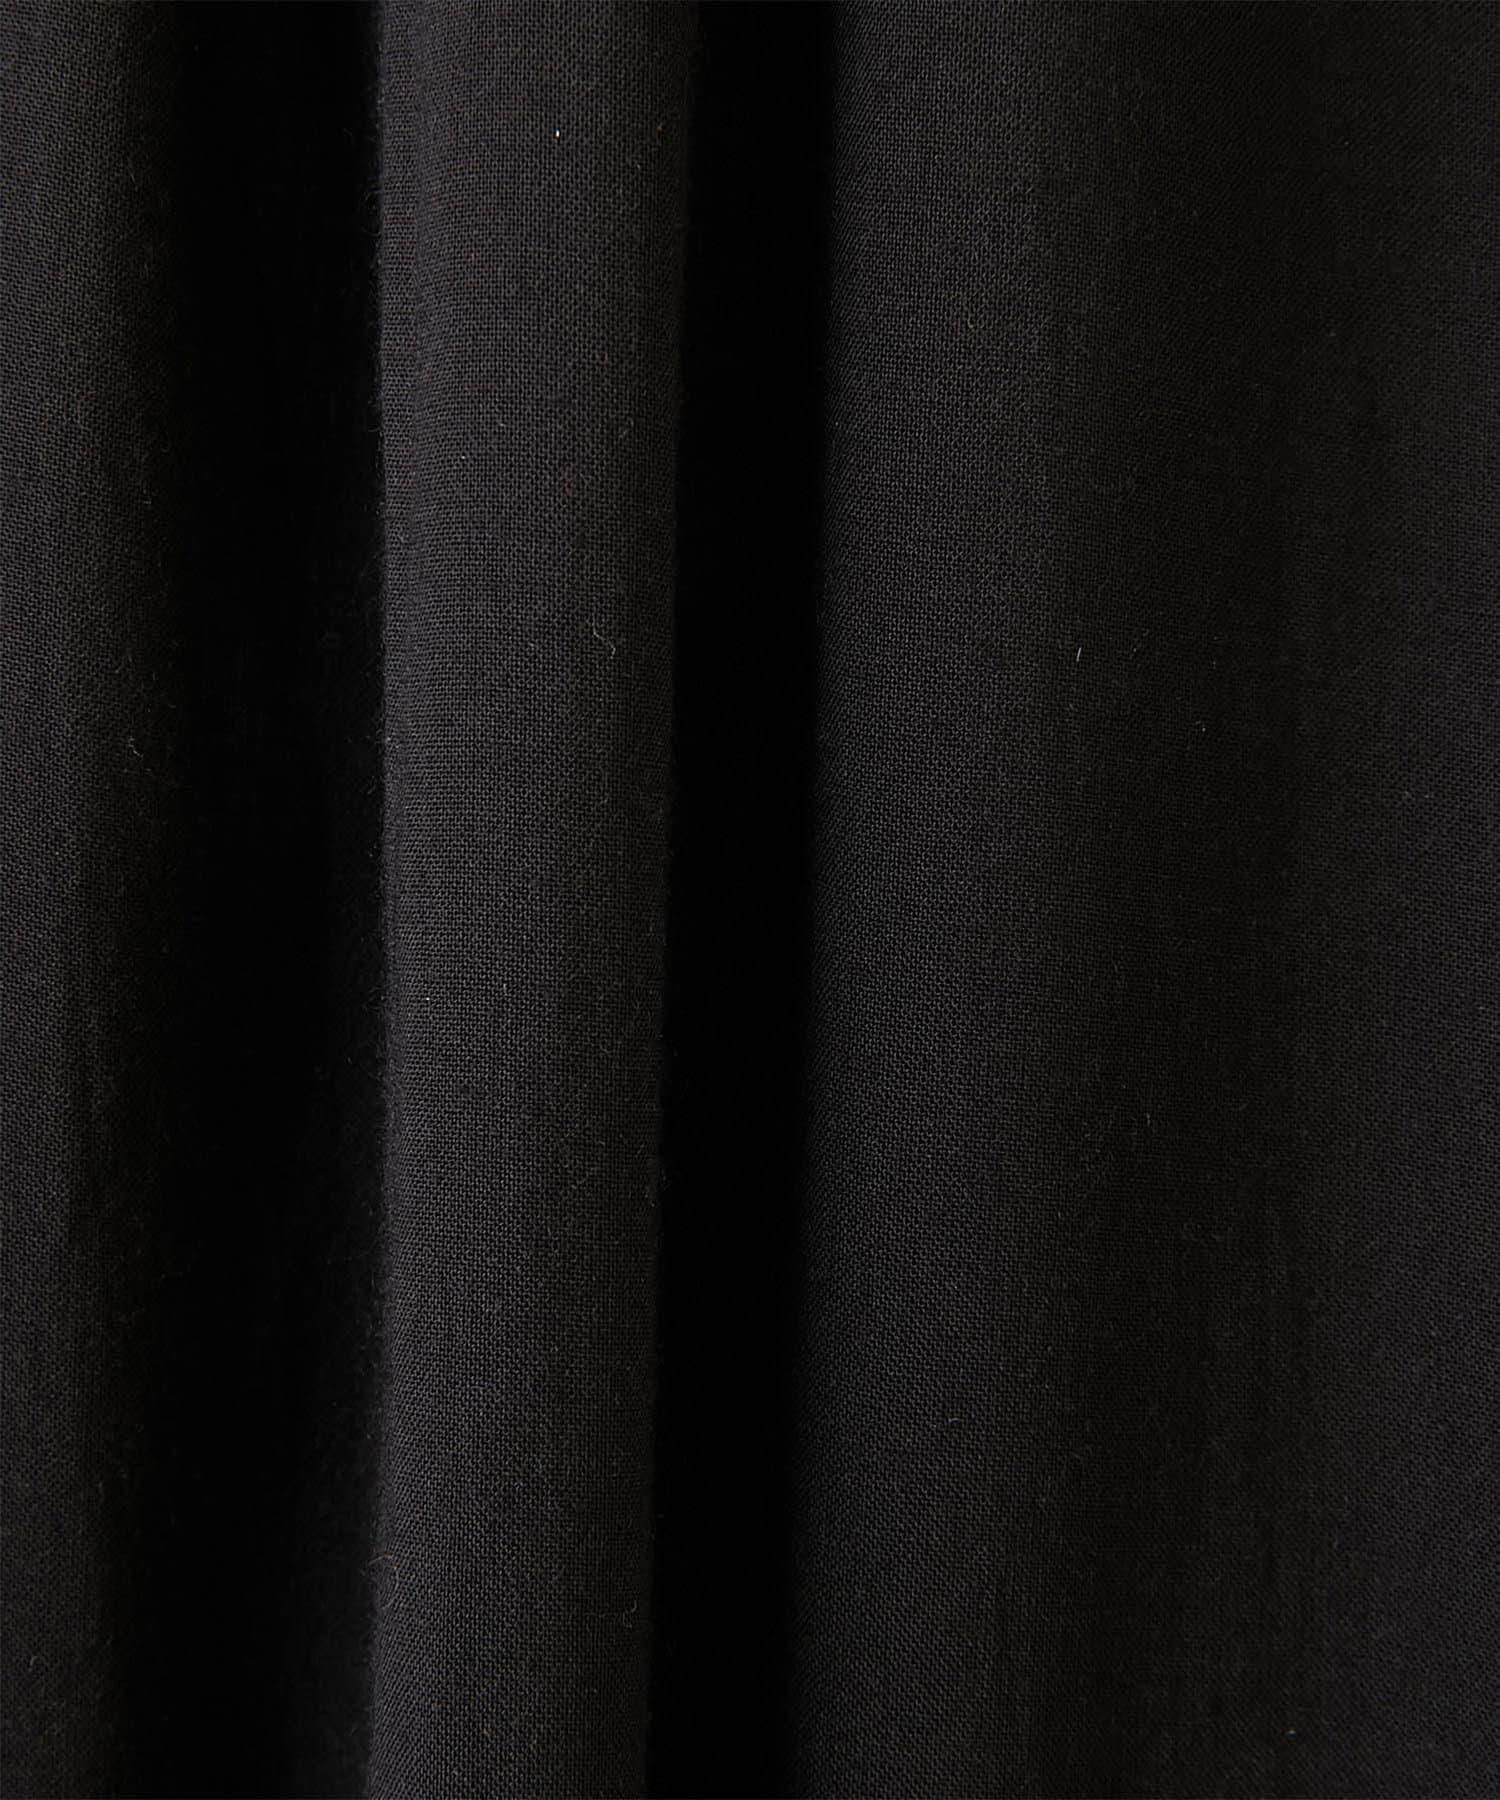 GALLARDAGALANTE(ガリャルダガランテ) ティアードマキシキャミワンピース【オンラインストア限定商品】